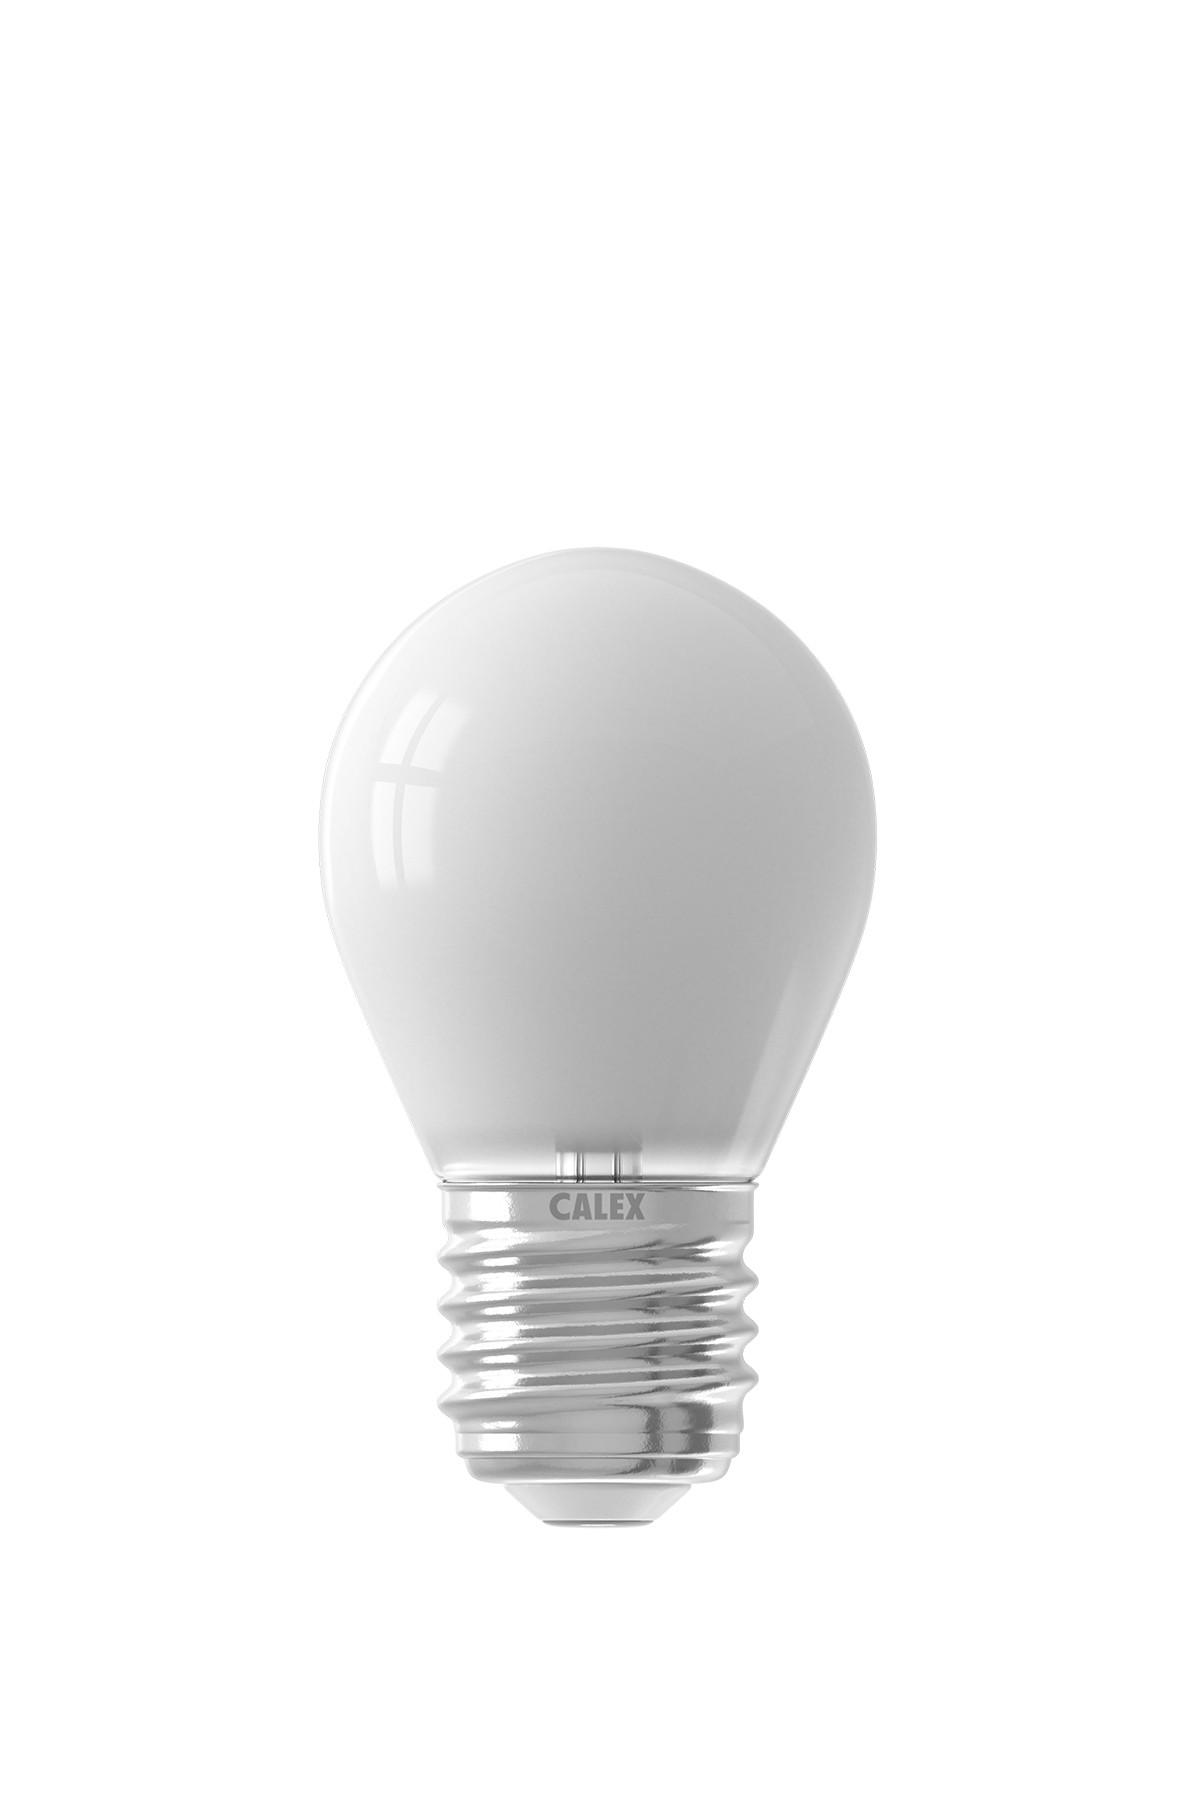 Calex Smart Kogel led lamp 4,5W 400lm 2200-4000K